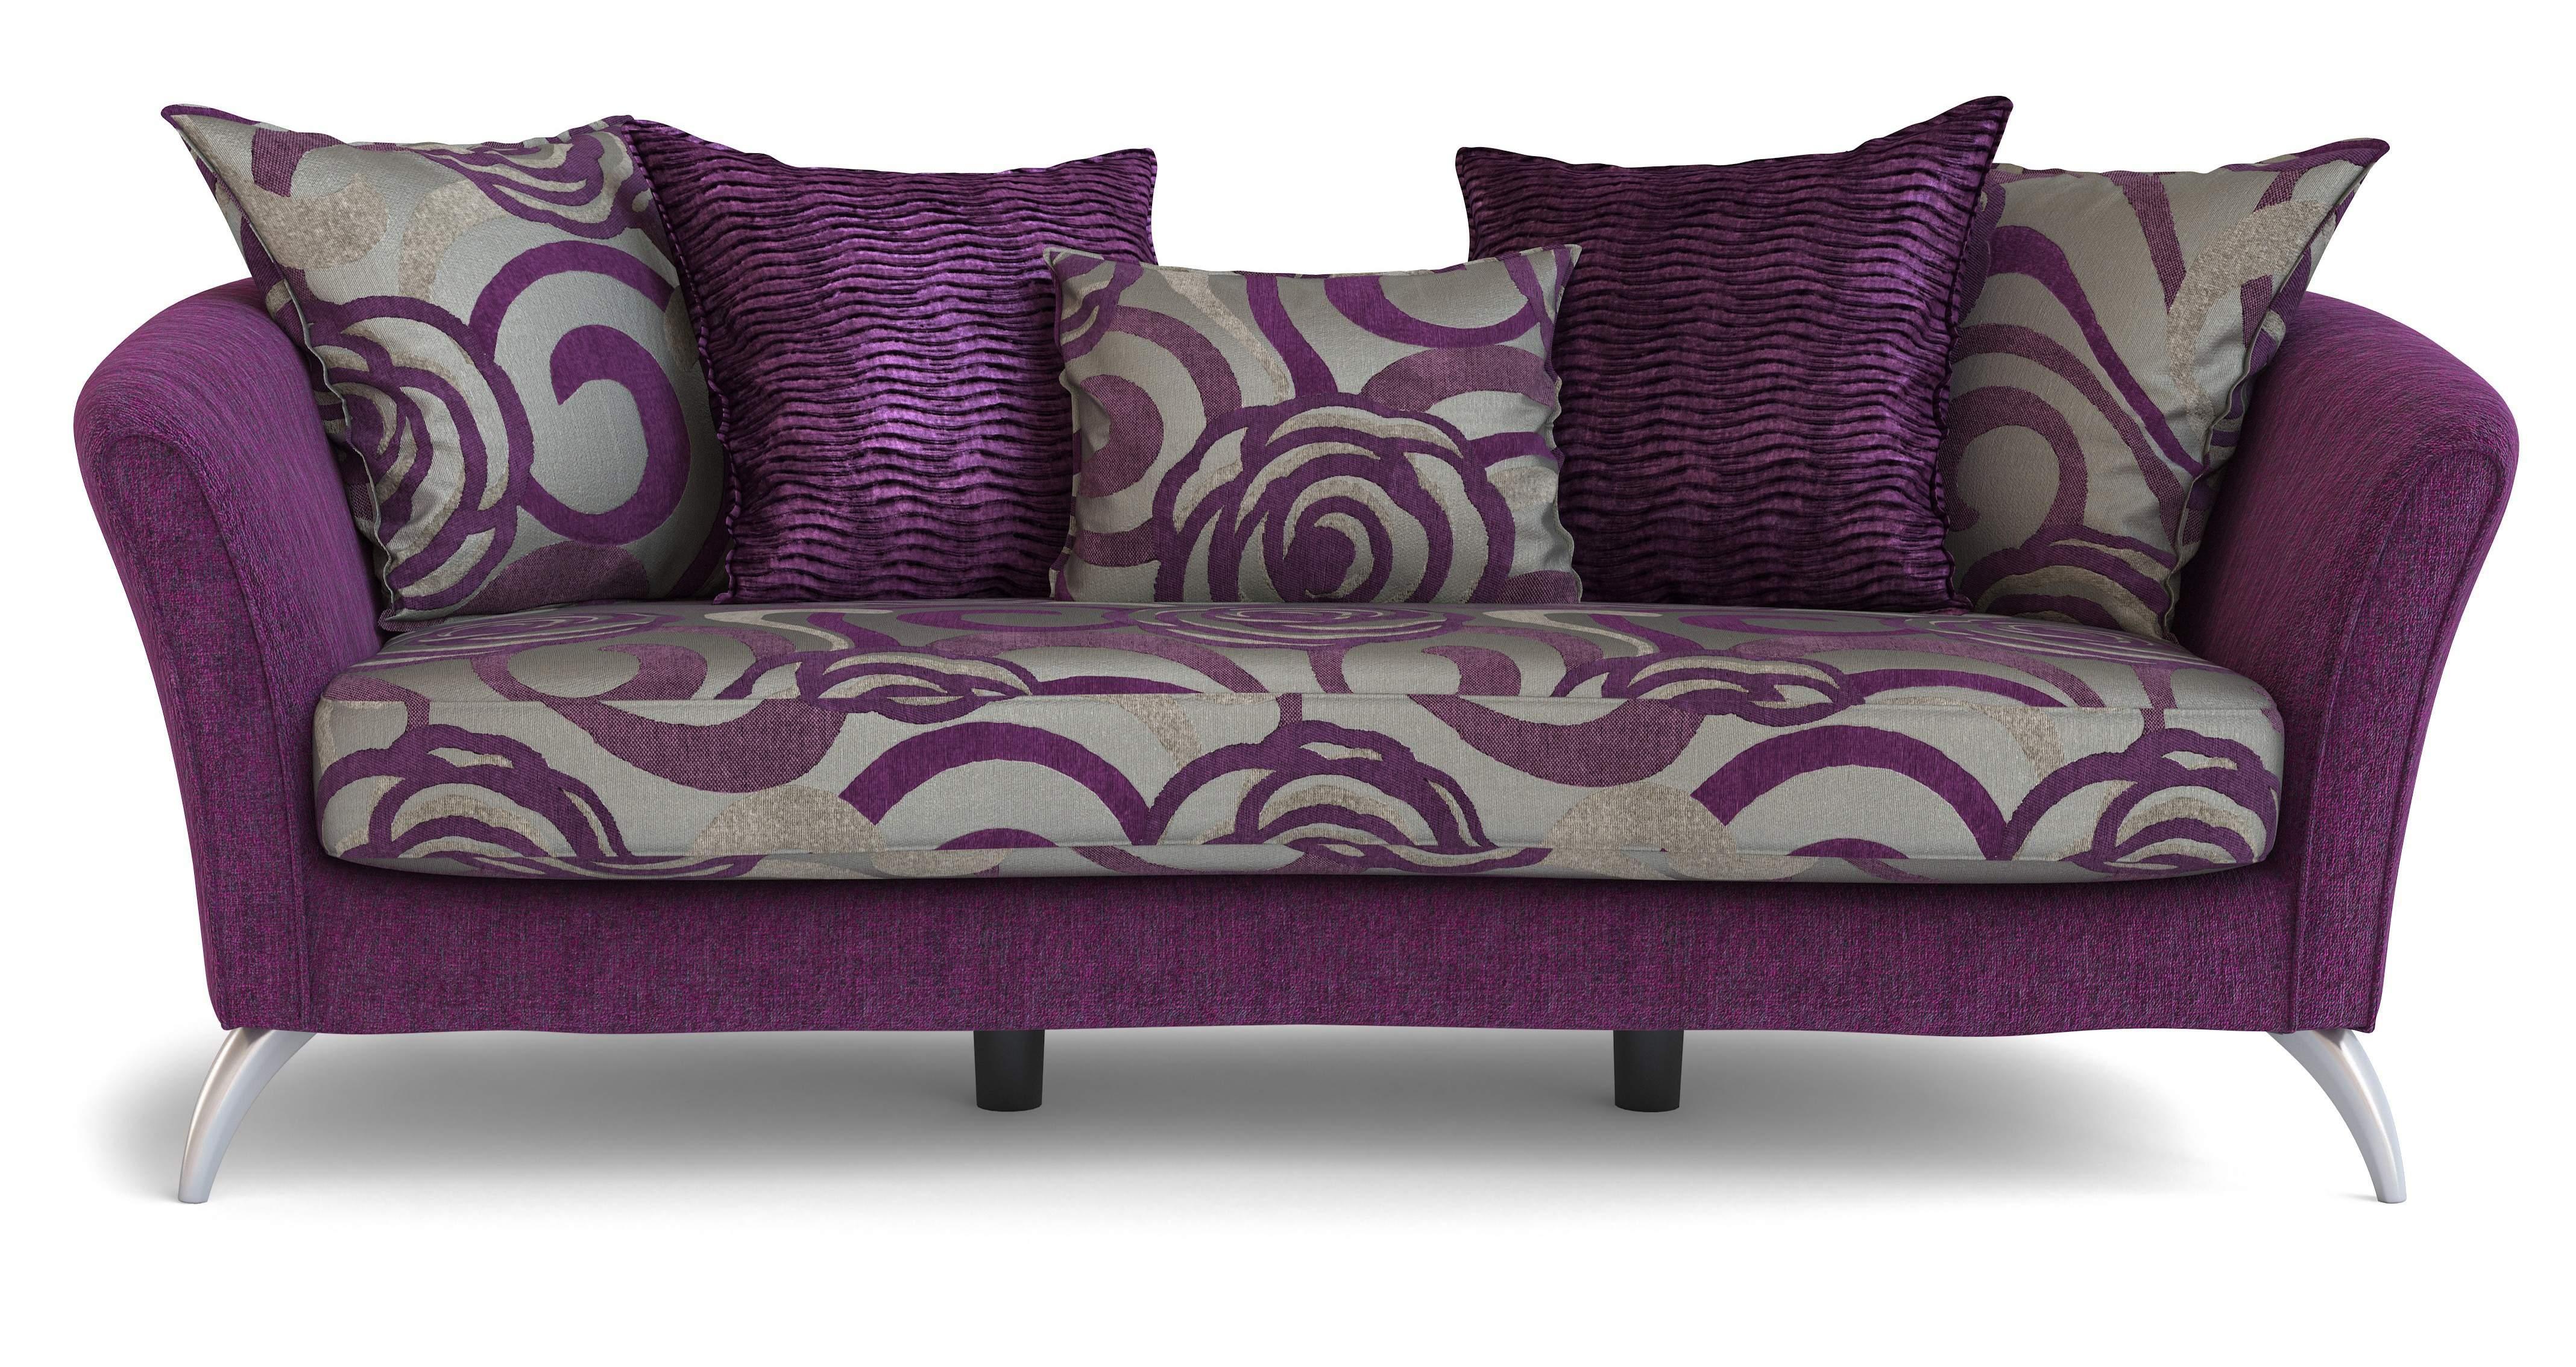 dfs nikita set 4 seater amethyst sofa cuddler sofa. Black Bedroom Furniture Sets. Home Design Ideas